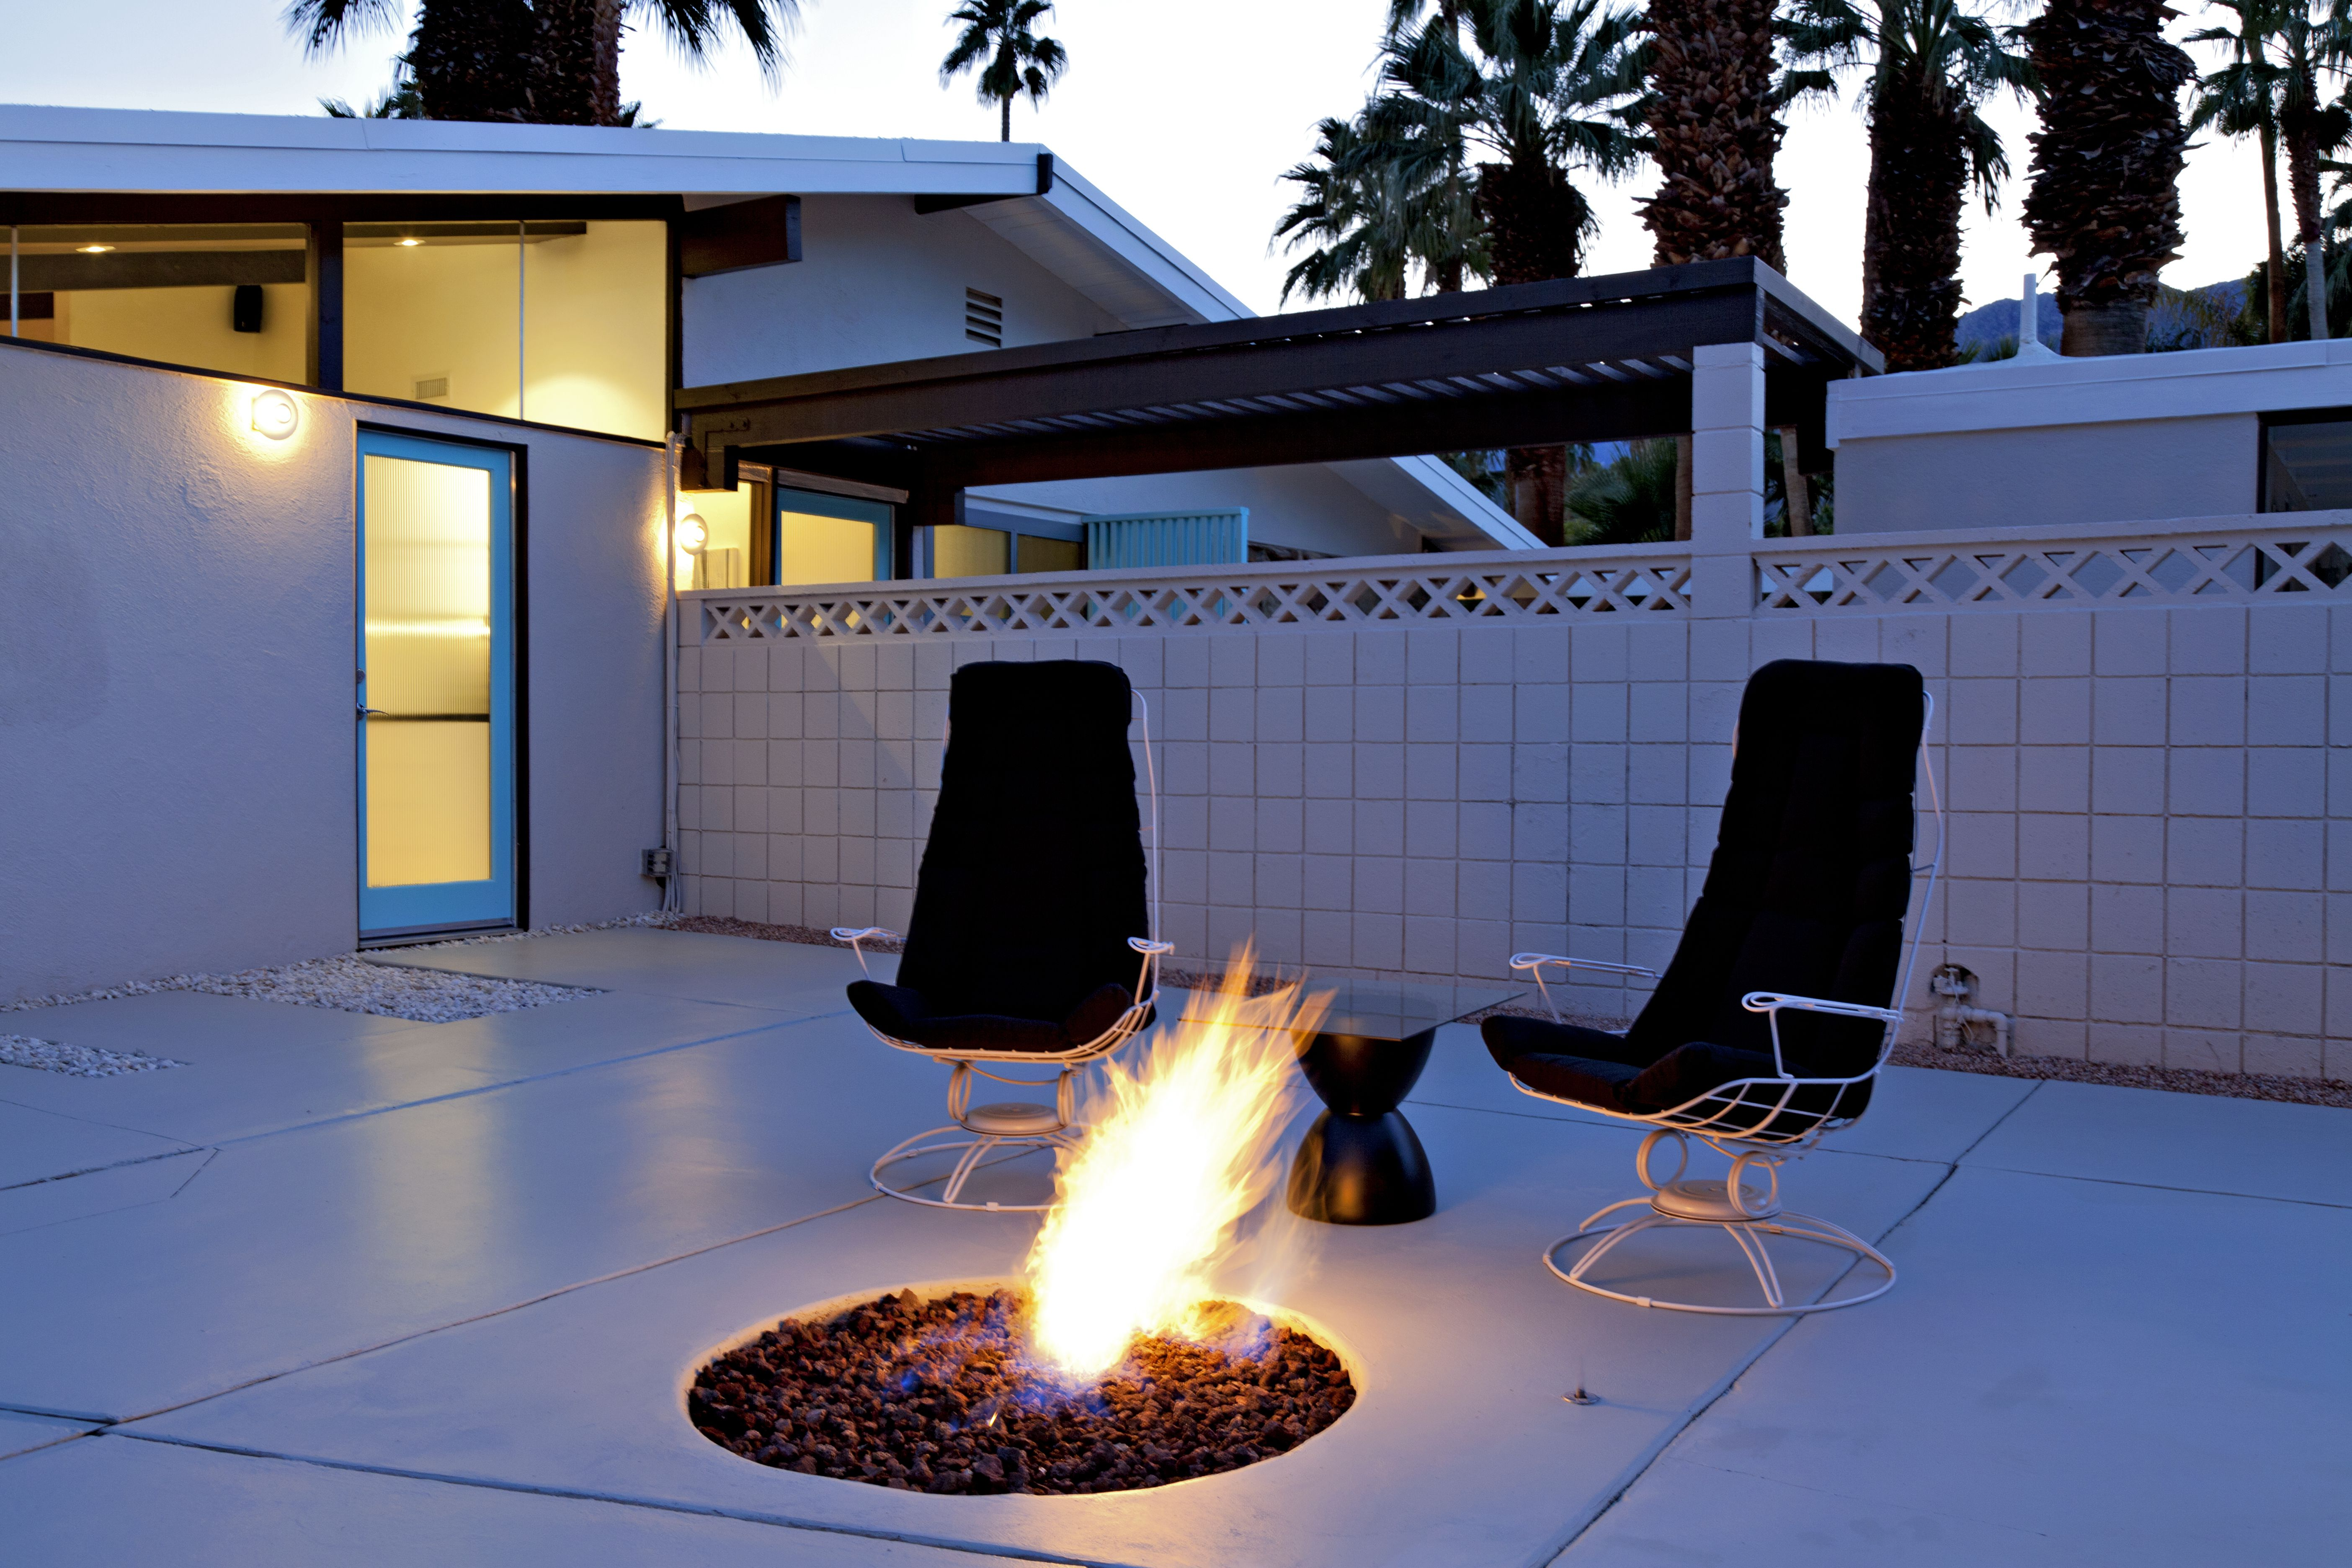 Concrete Patios: 12 Great Designs and Ideas on Concrete Slab Backyard Ideas id=86837